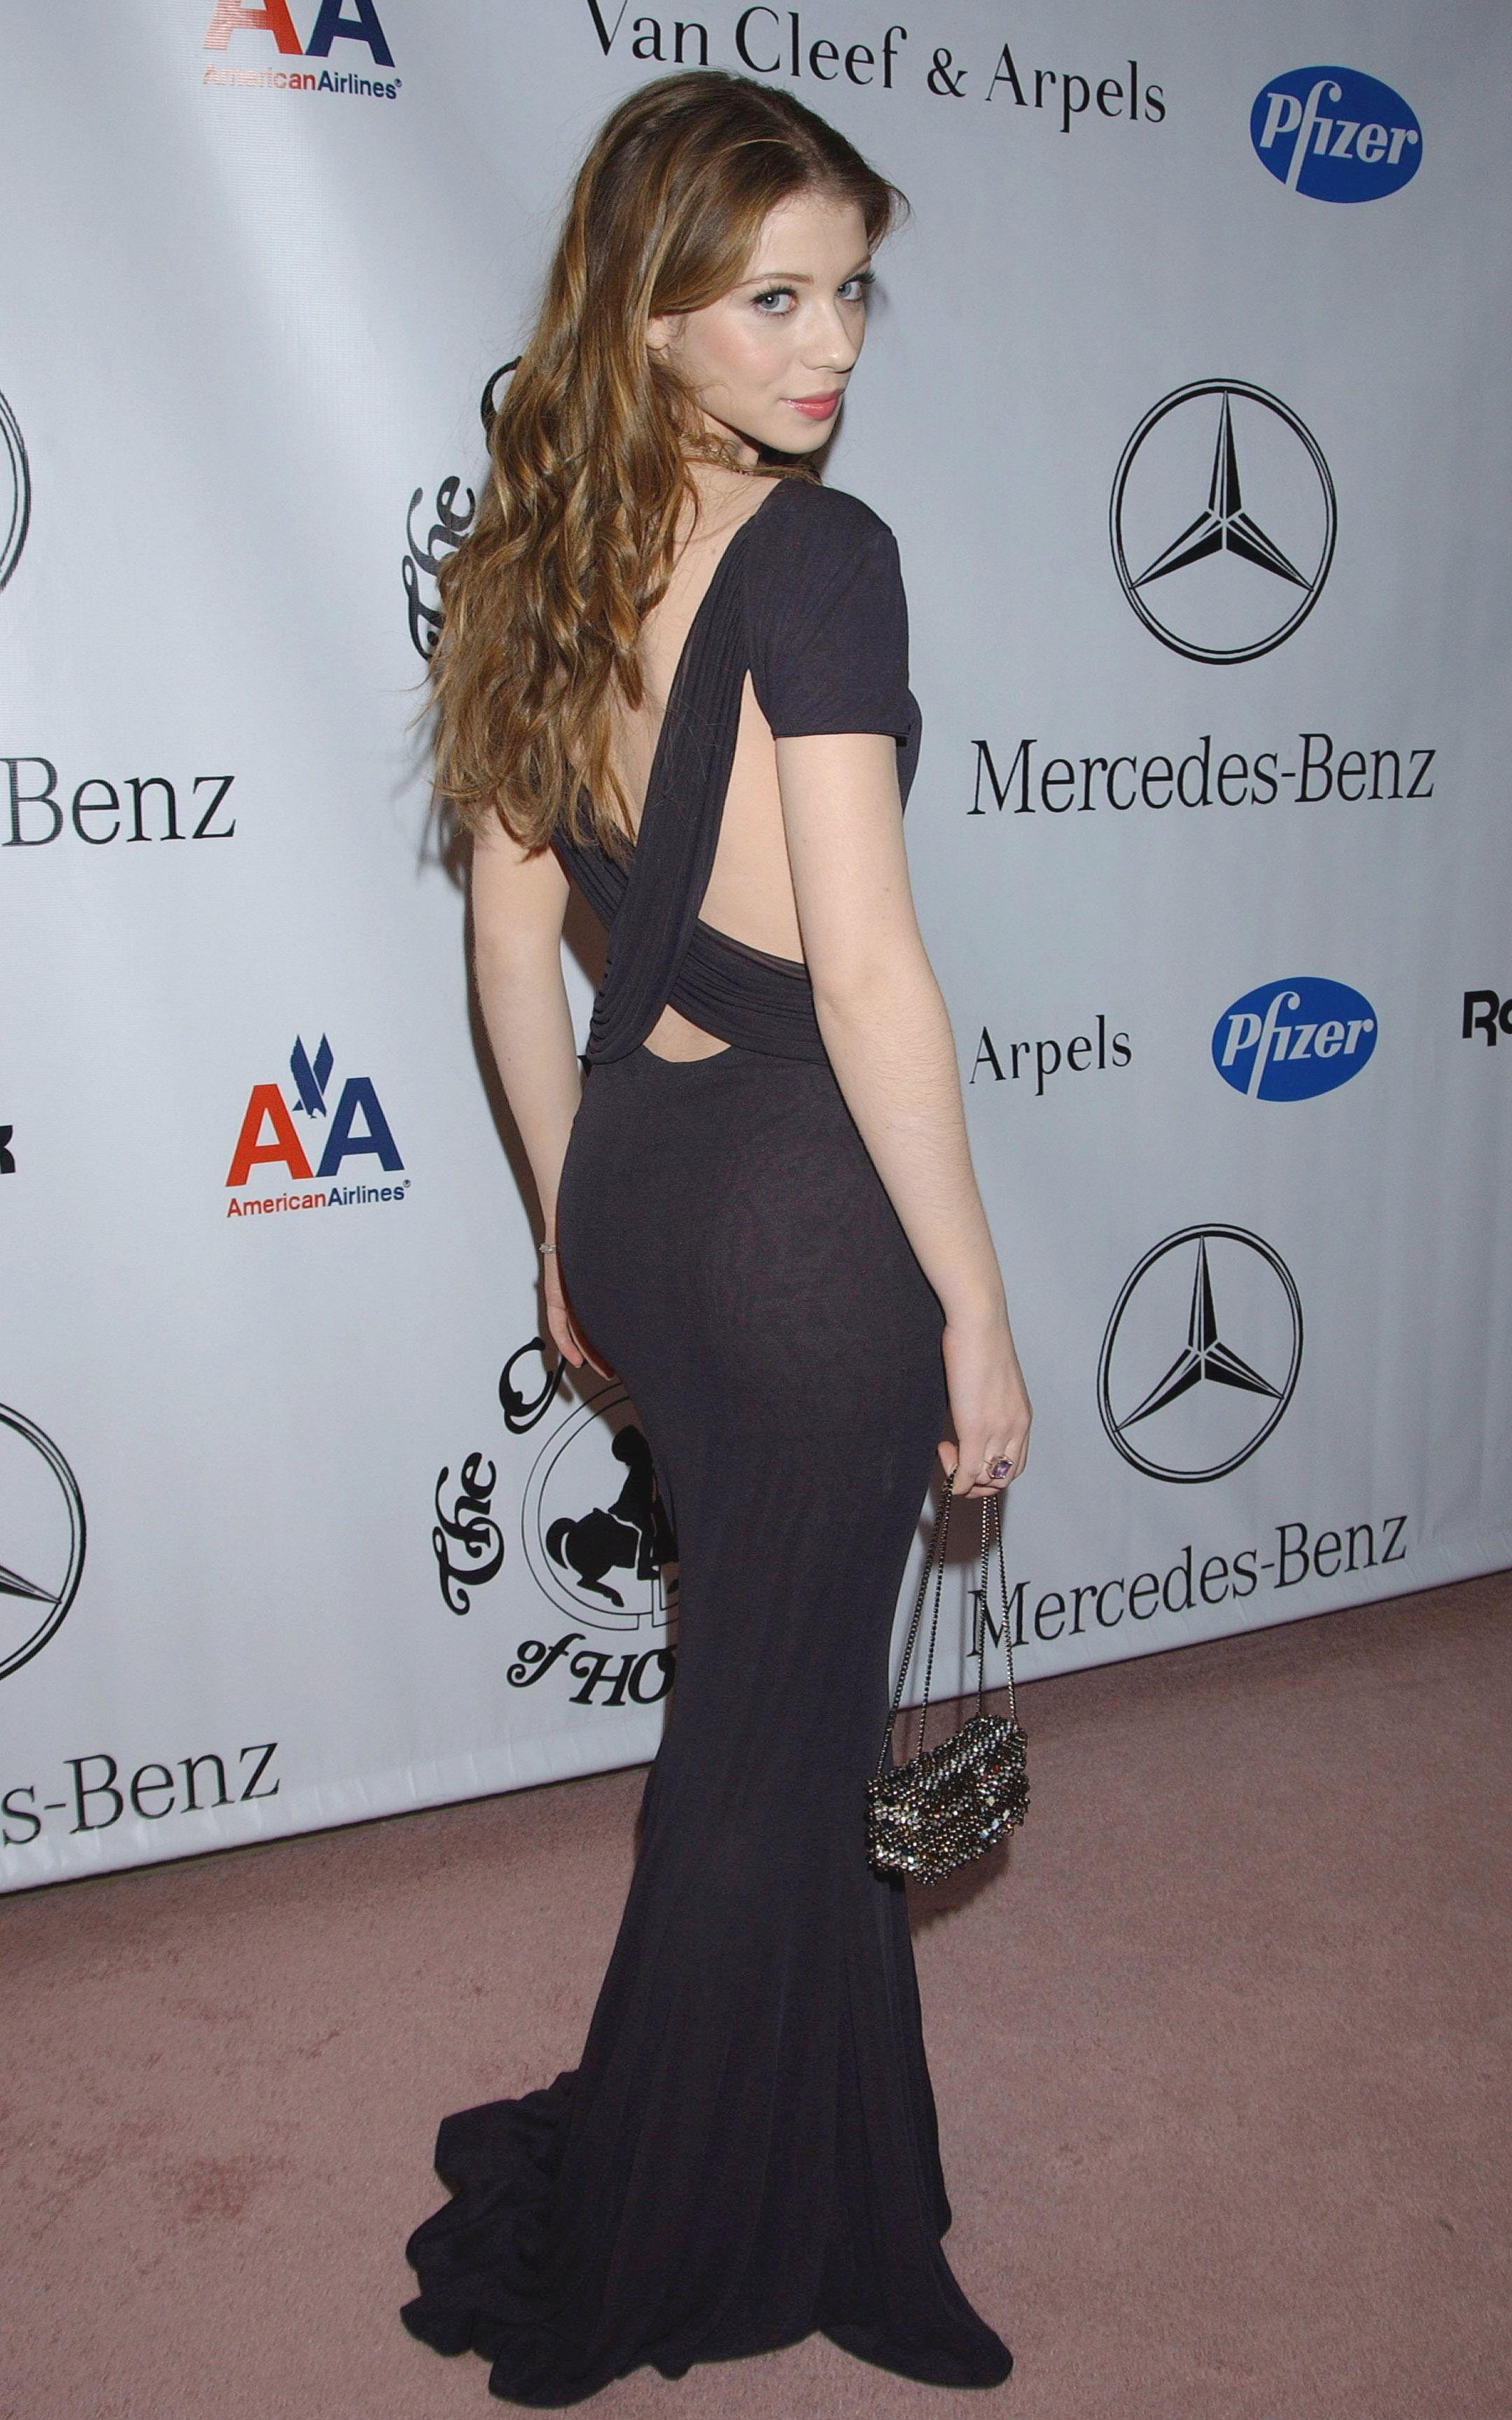 Michelle Trachtenberg #gentlemanboners #hot #sexy #photooftheday #model #beautiful #wcw